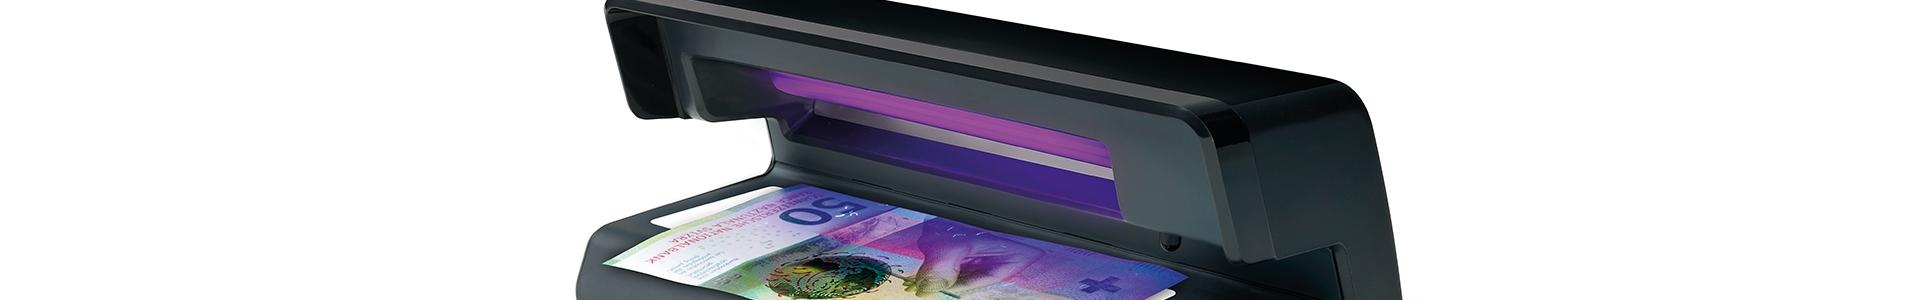 Counterfeit Detectors 2